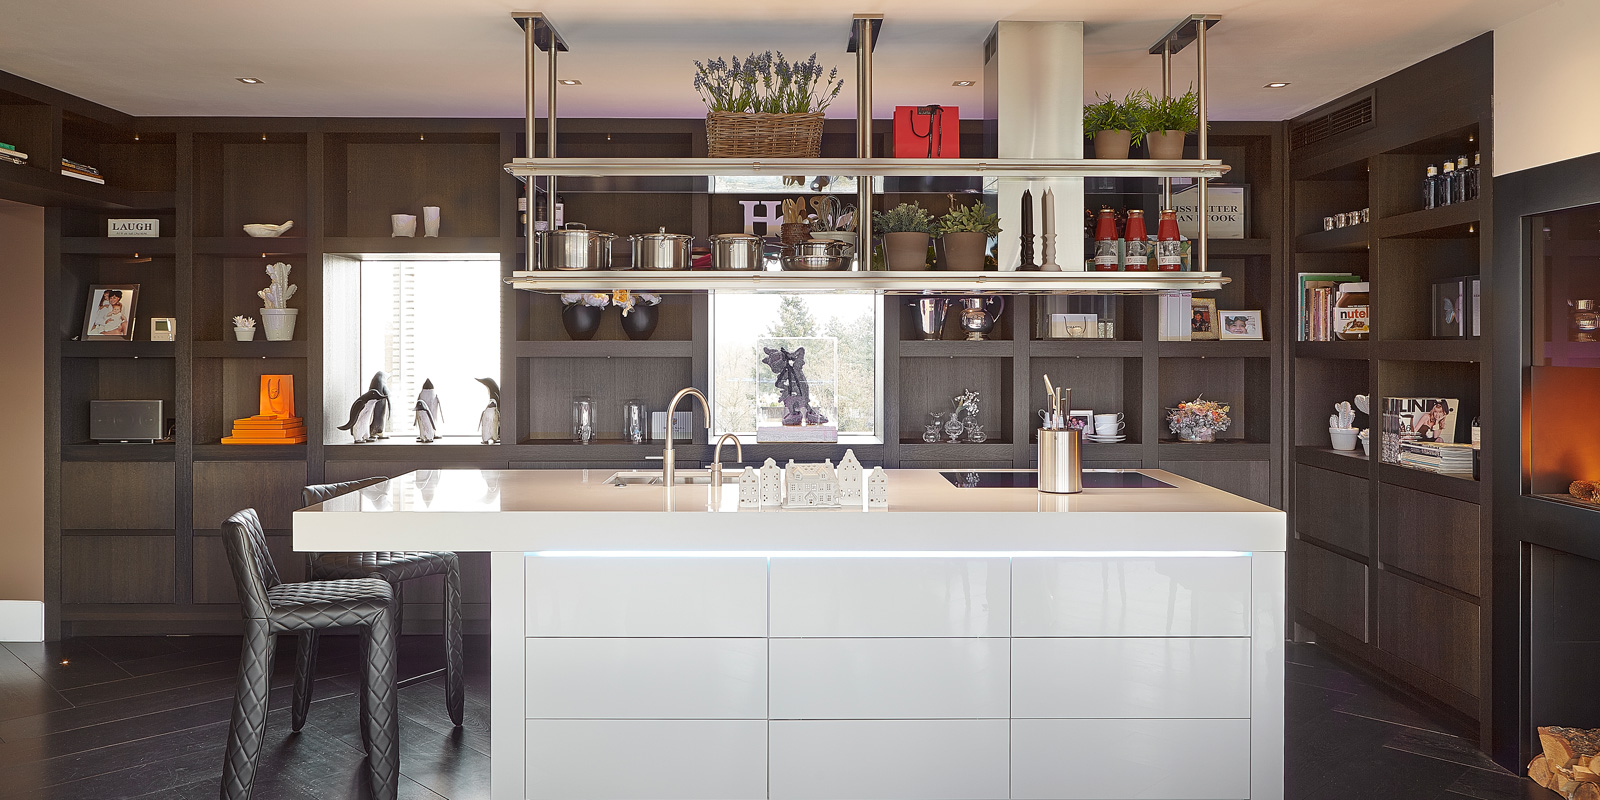 Renovatie penthouse | RMR Interieurbouw